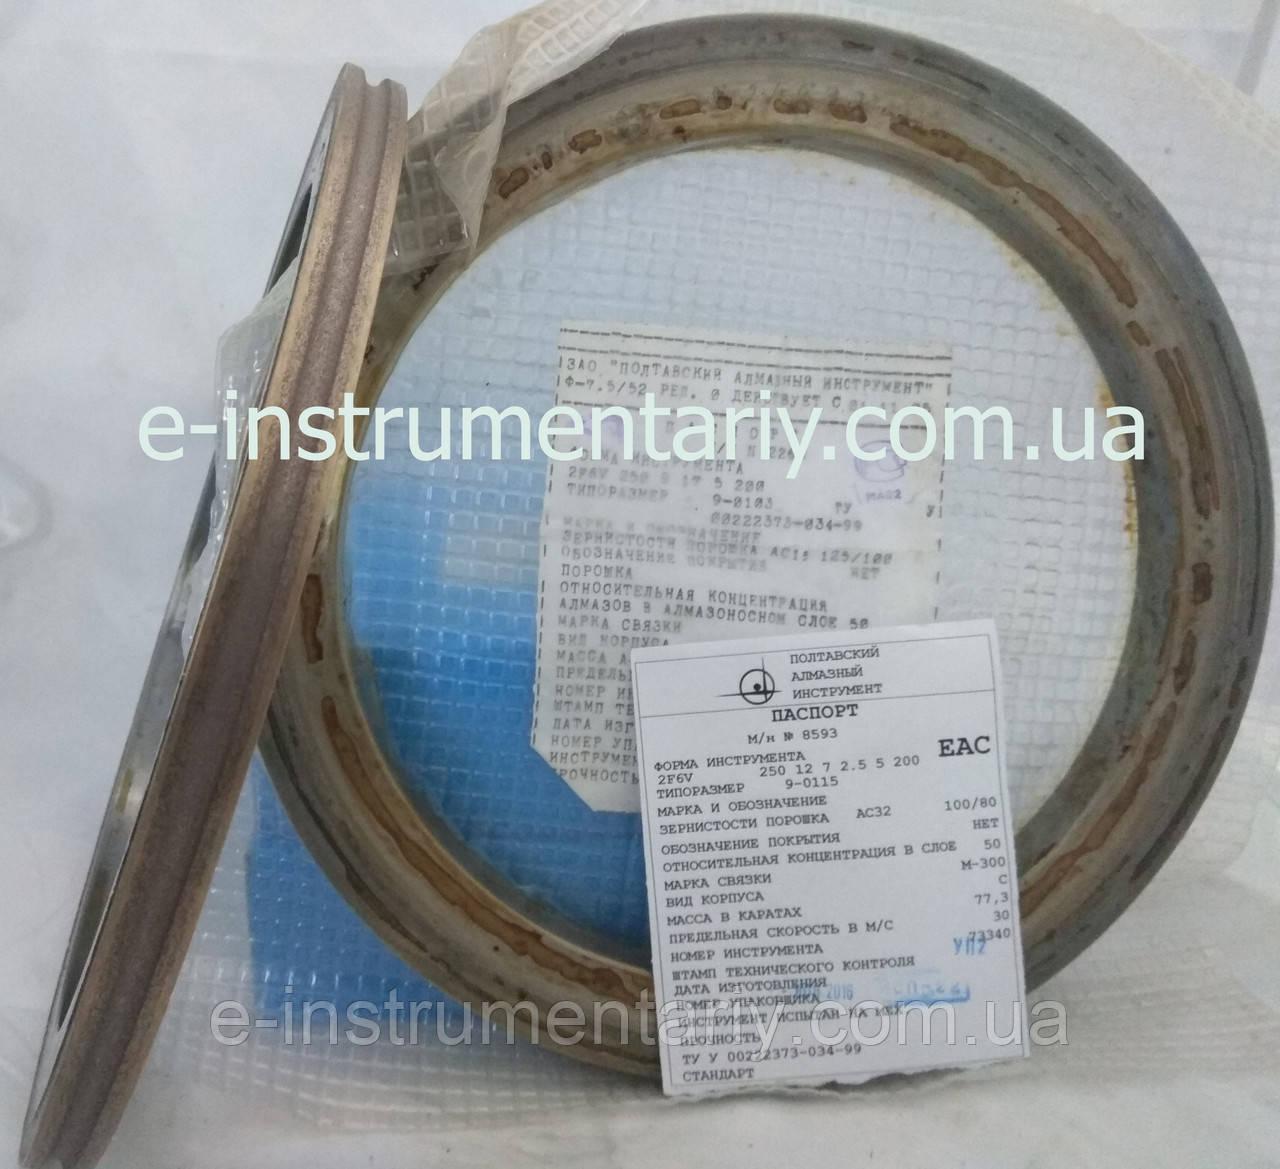 Алмазный круг (2F6V) R2,5 250х12х7хR2,5х200 для обработки кромки стекла АС32 связка М-300